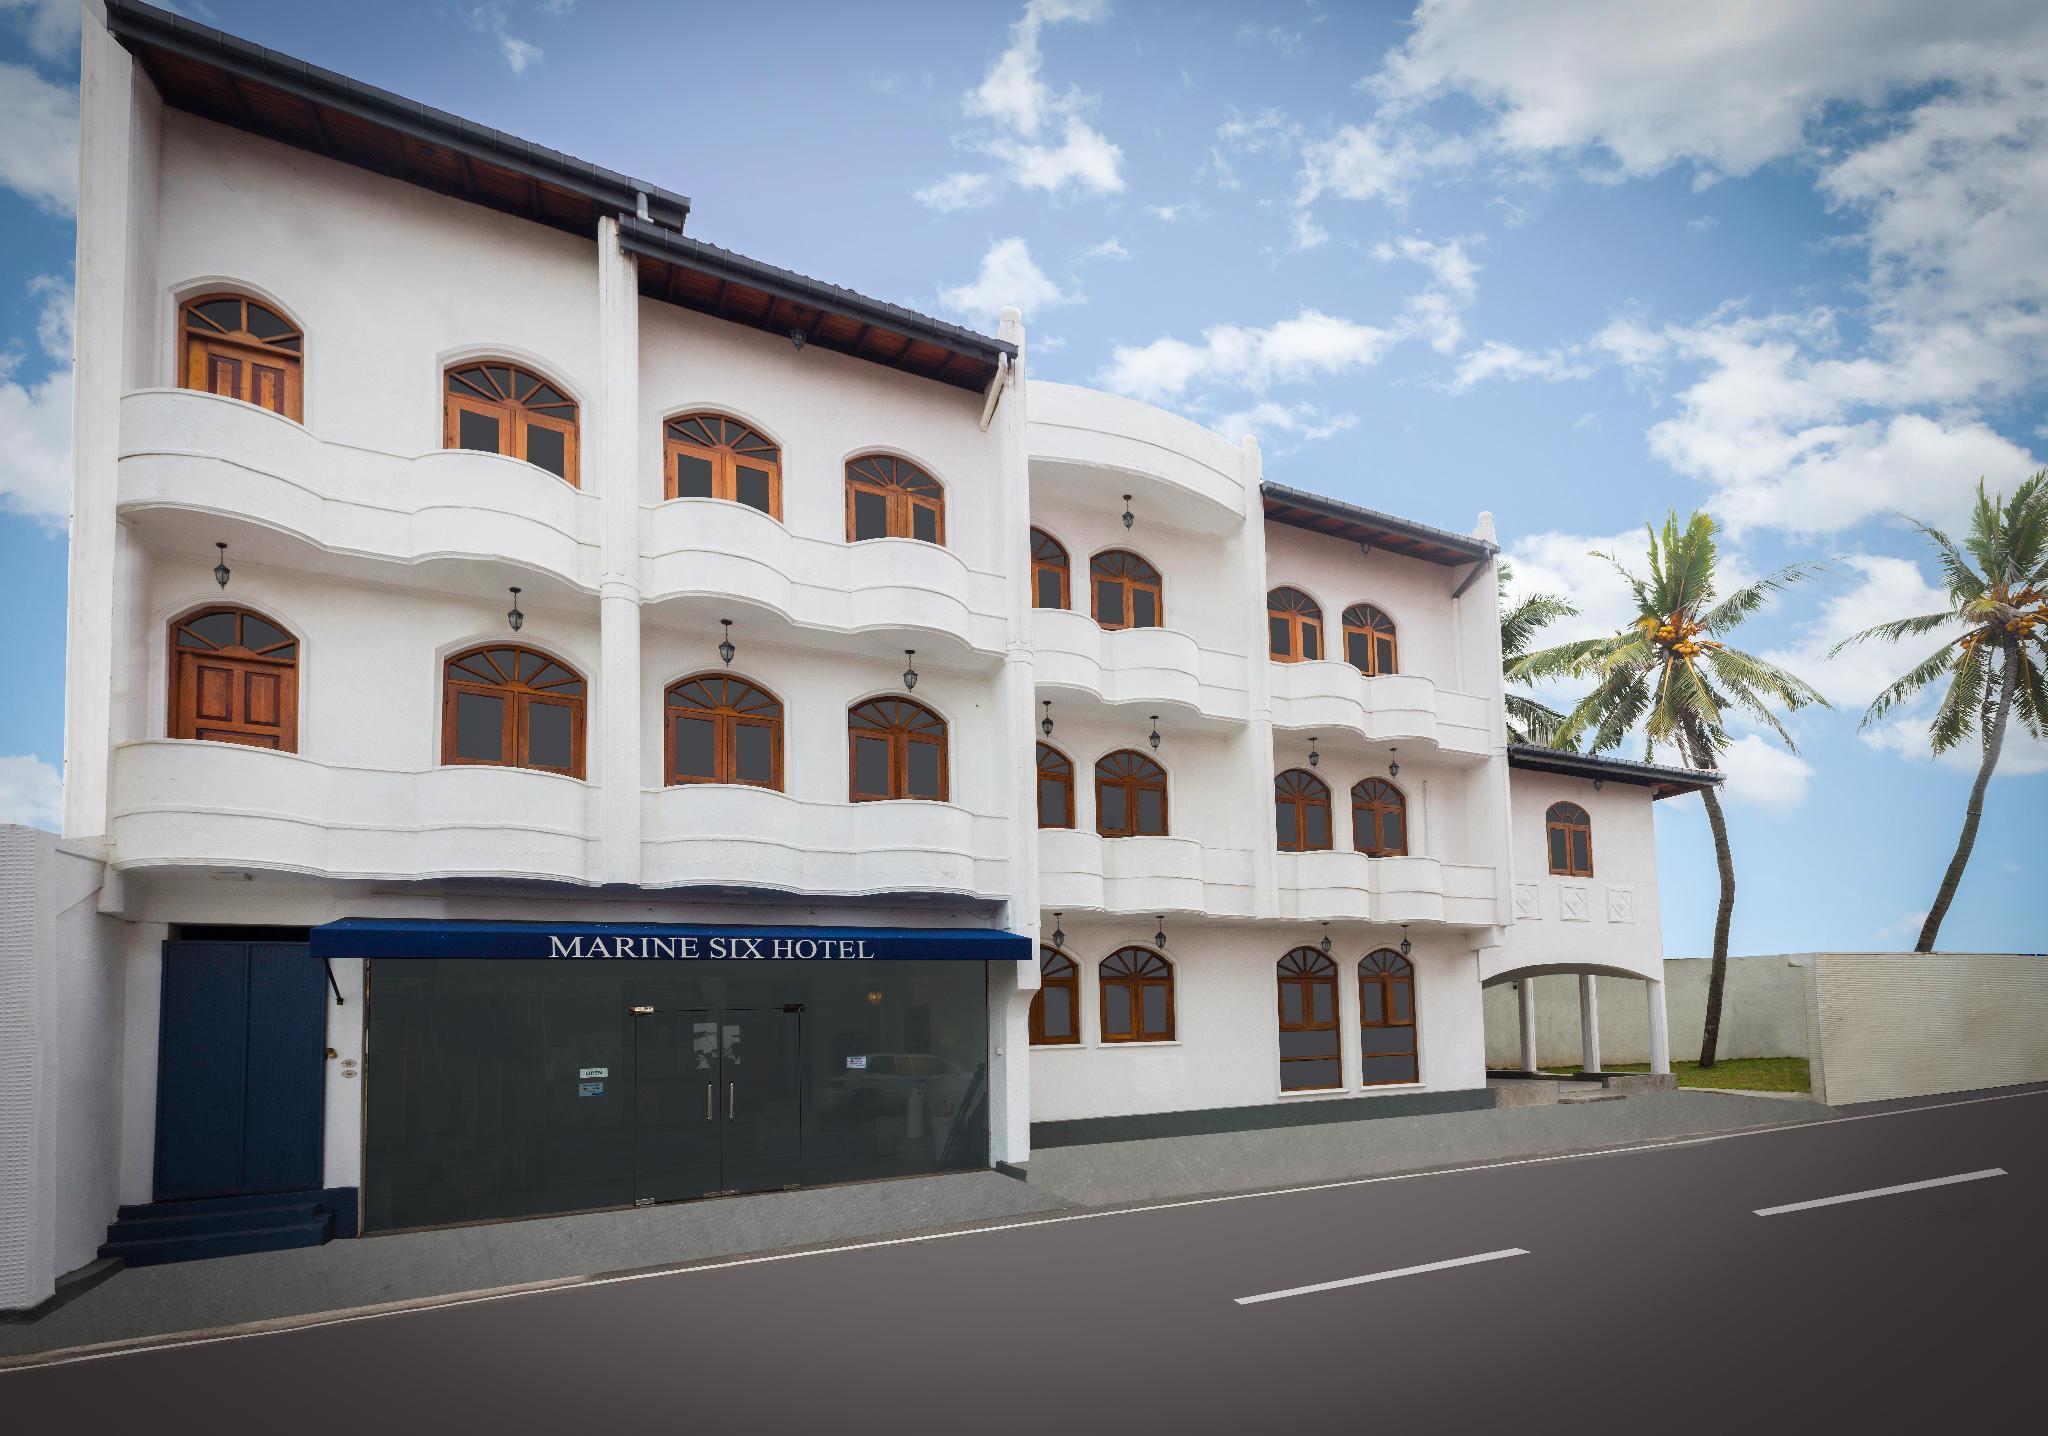 Marine Six Hotel